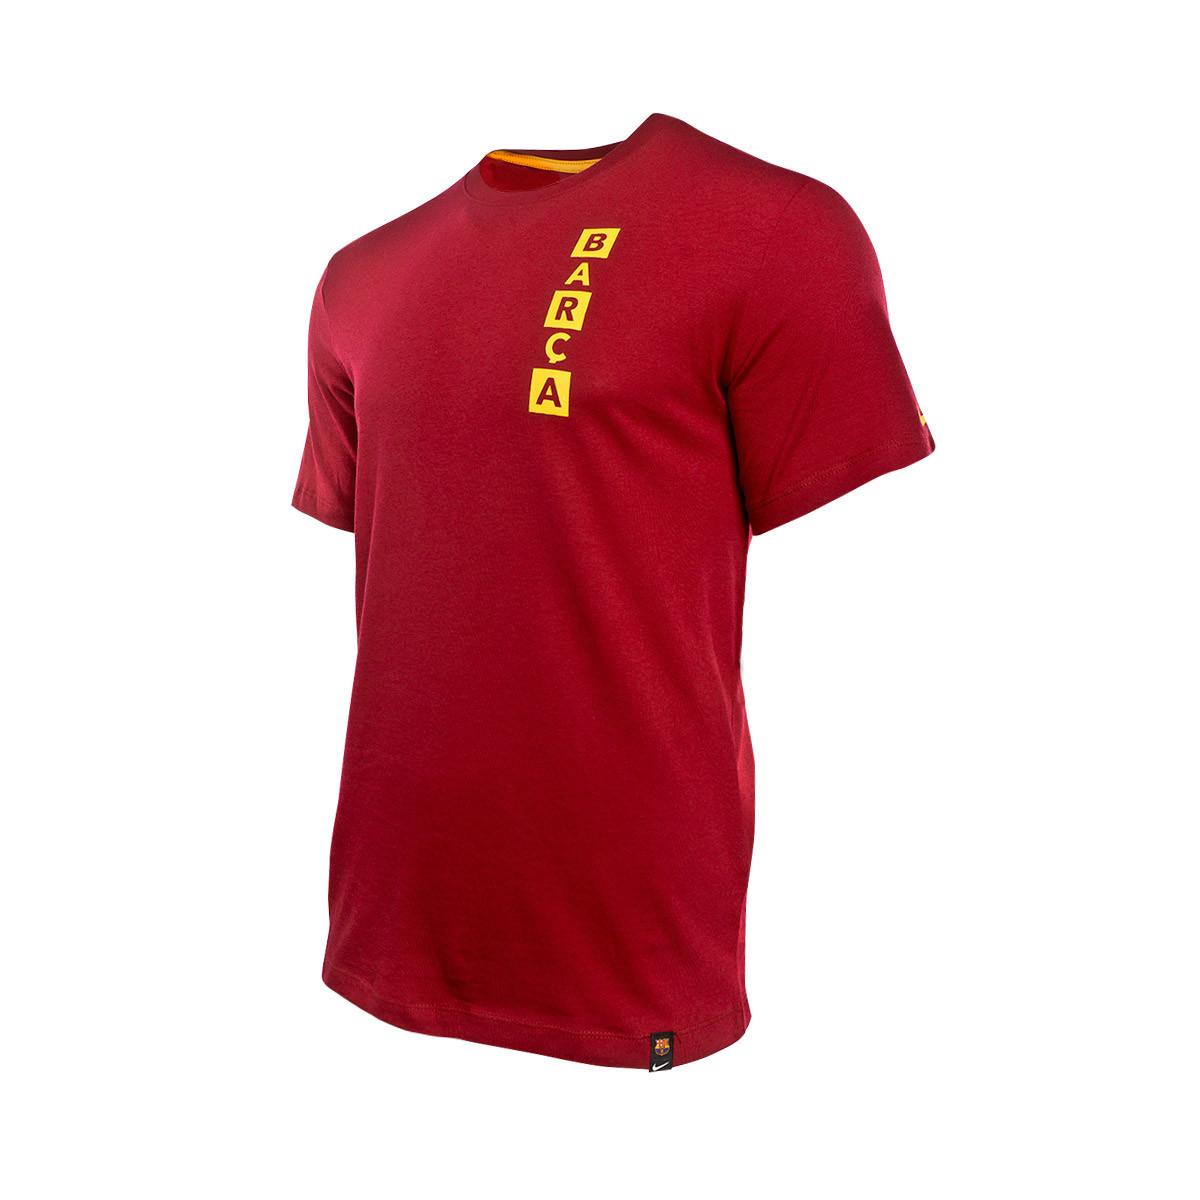 size 40 87408 d11f0 Camiseta FC Barcelona Kit Story Tell 2018-2019 Noble red